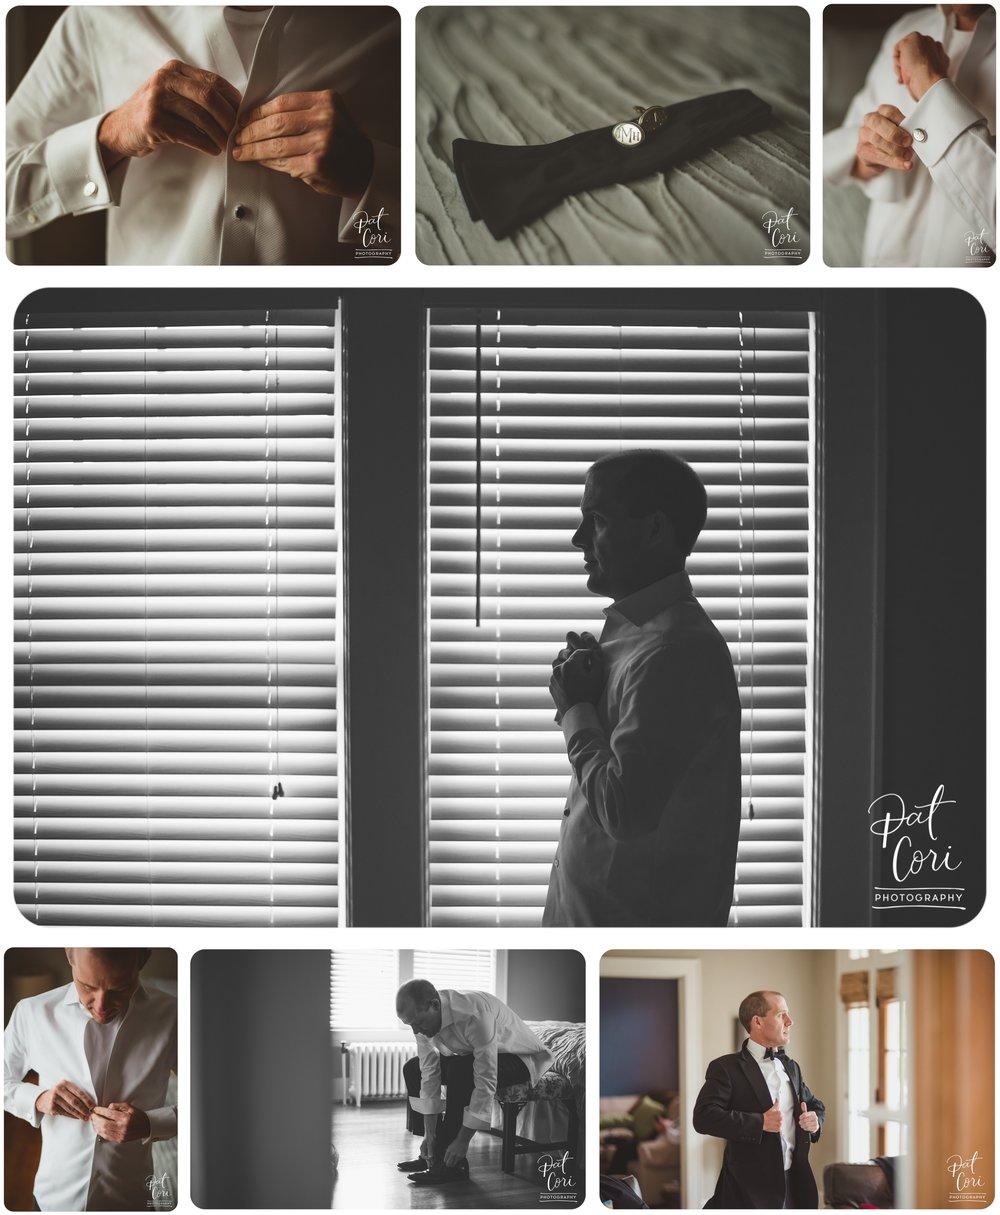 JenniferJim-Collage-02.jpg